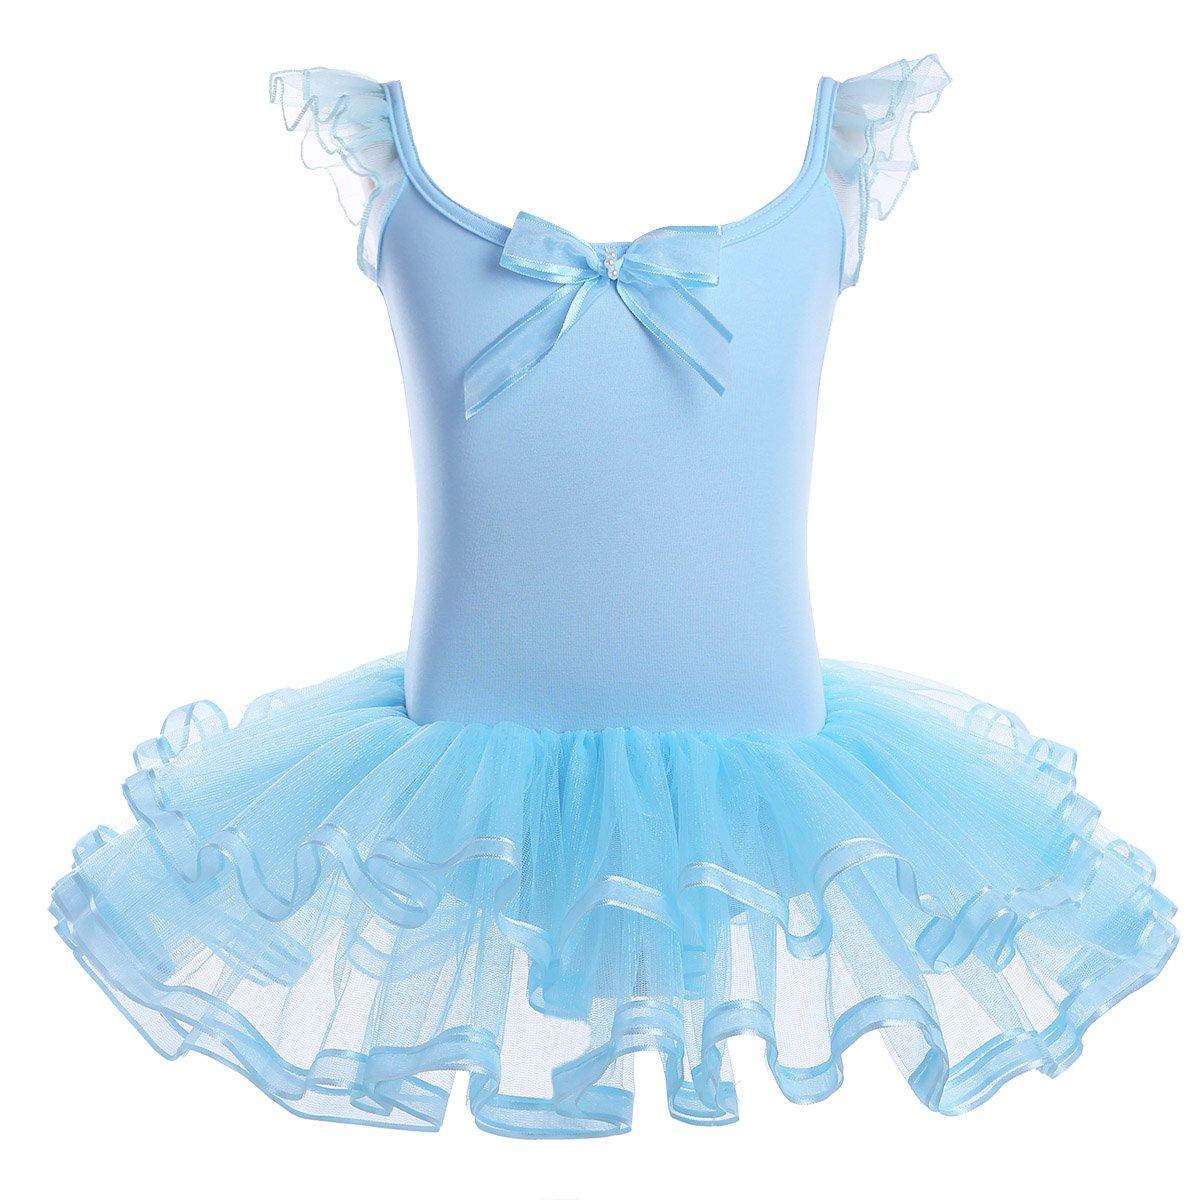 YiZYiF Little Girls' Ruffled Mesh Ballet Dancing Leotard Tutu Skirt Tiered Dress Dancewear